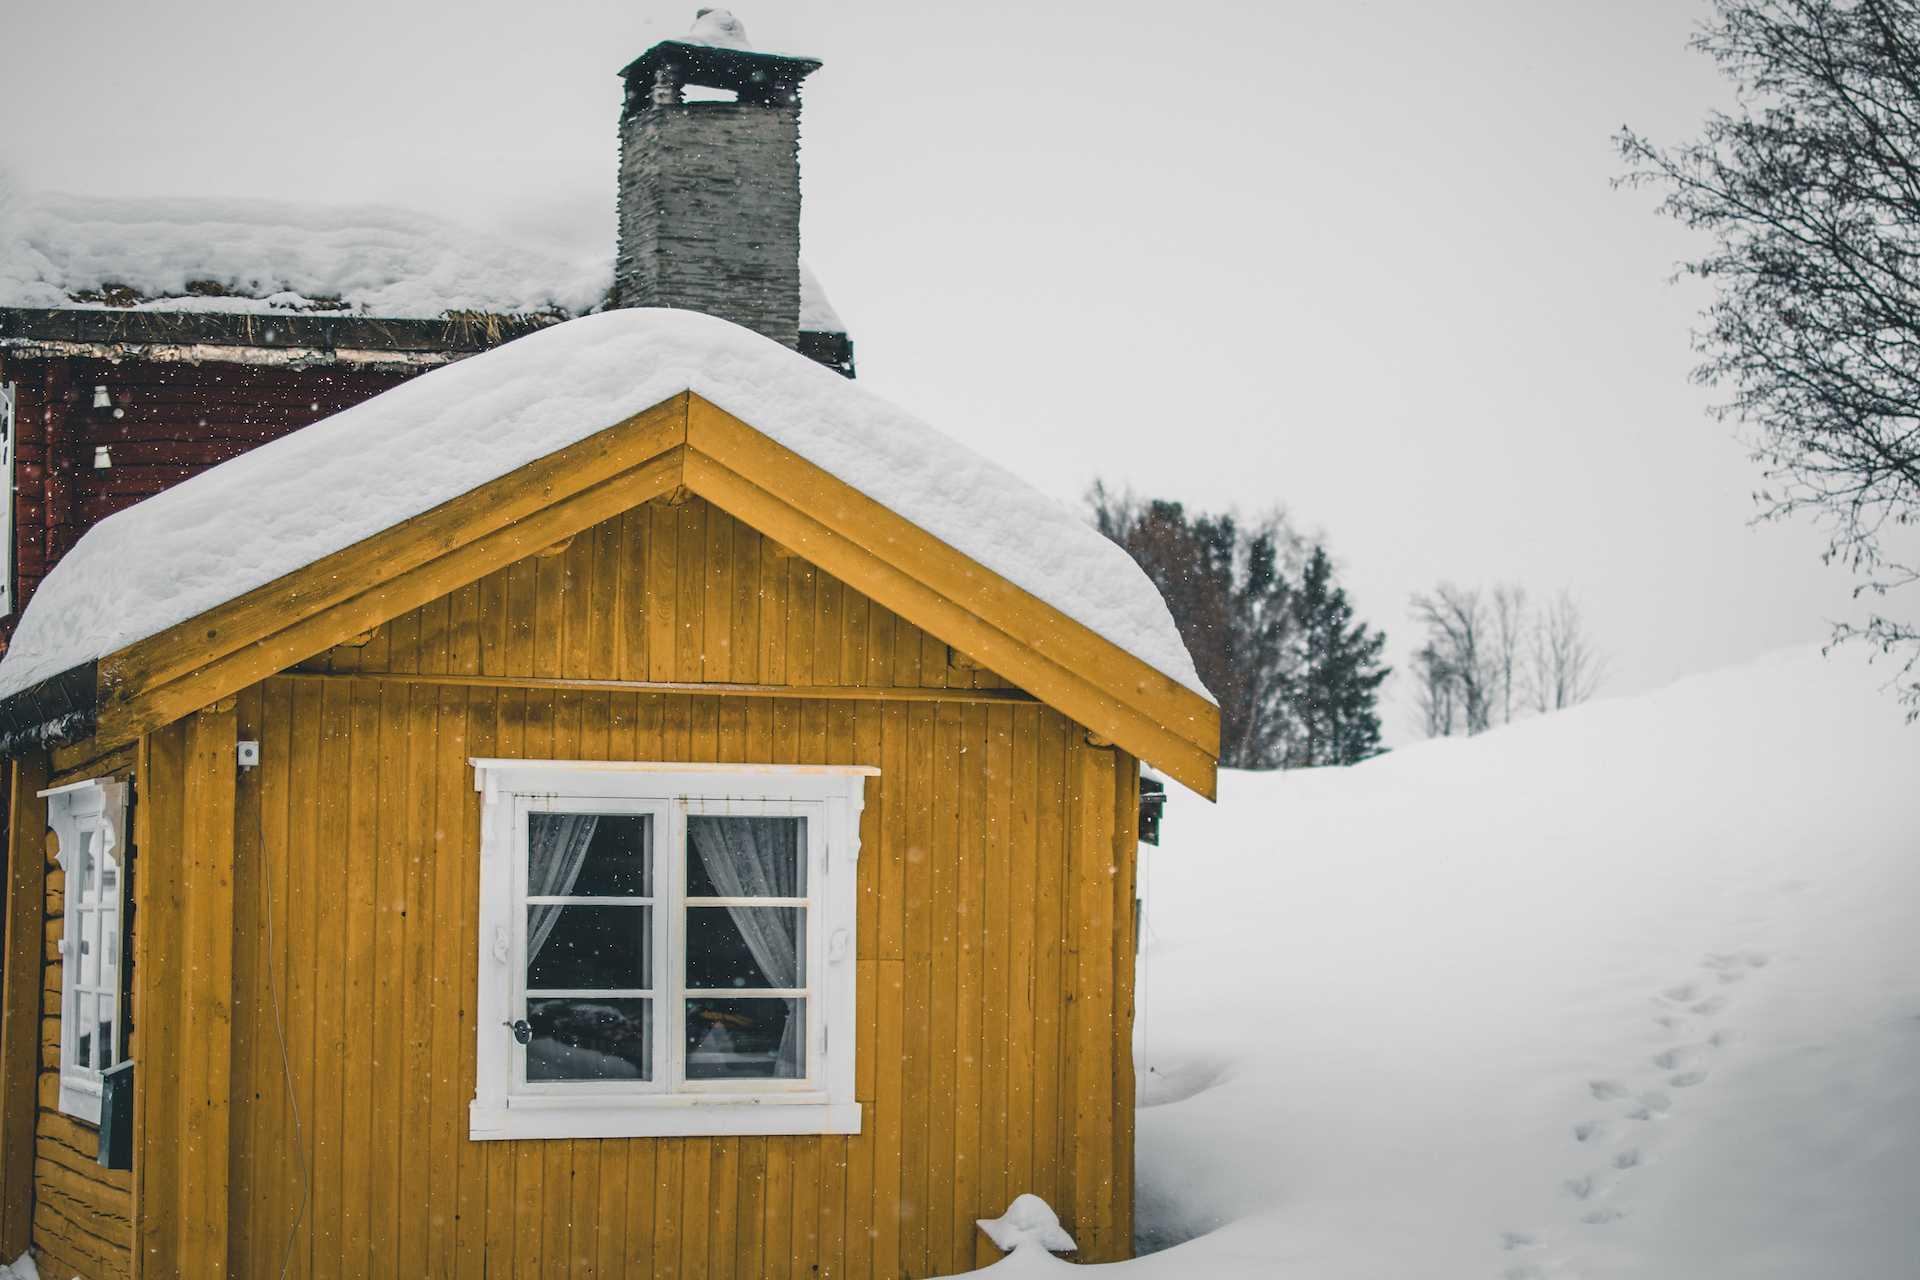 okolice Trondheim